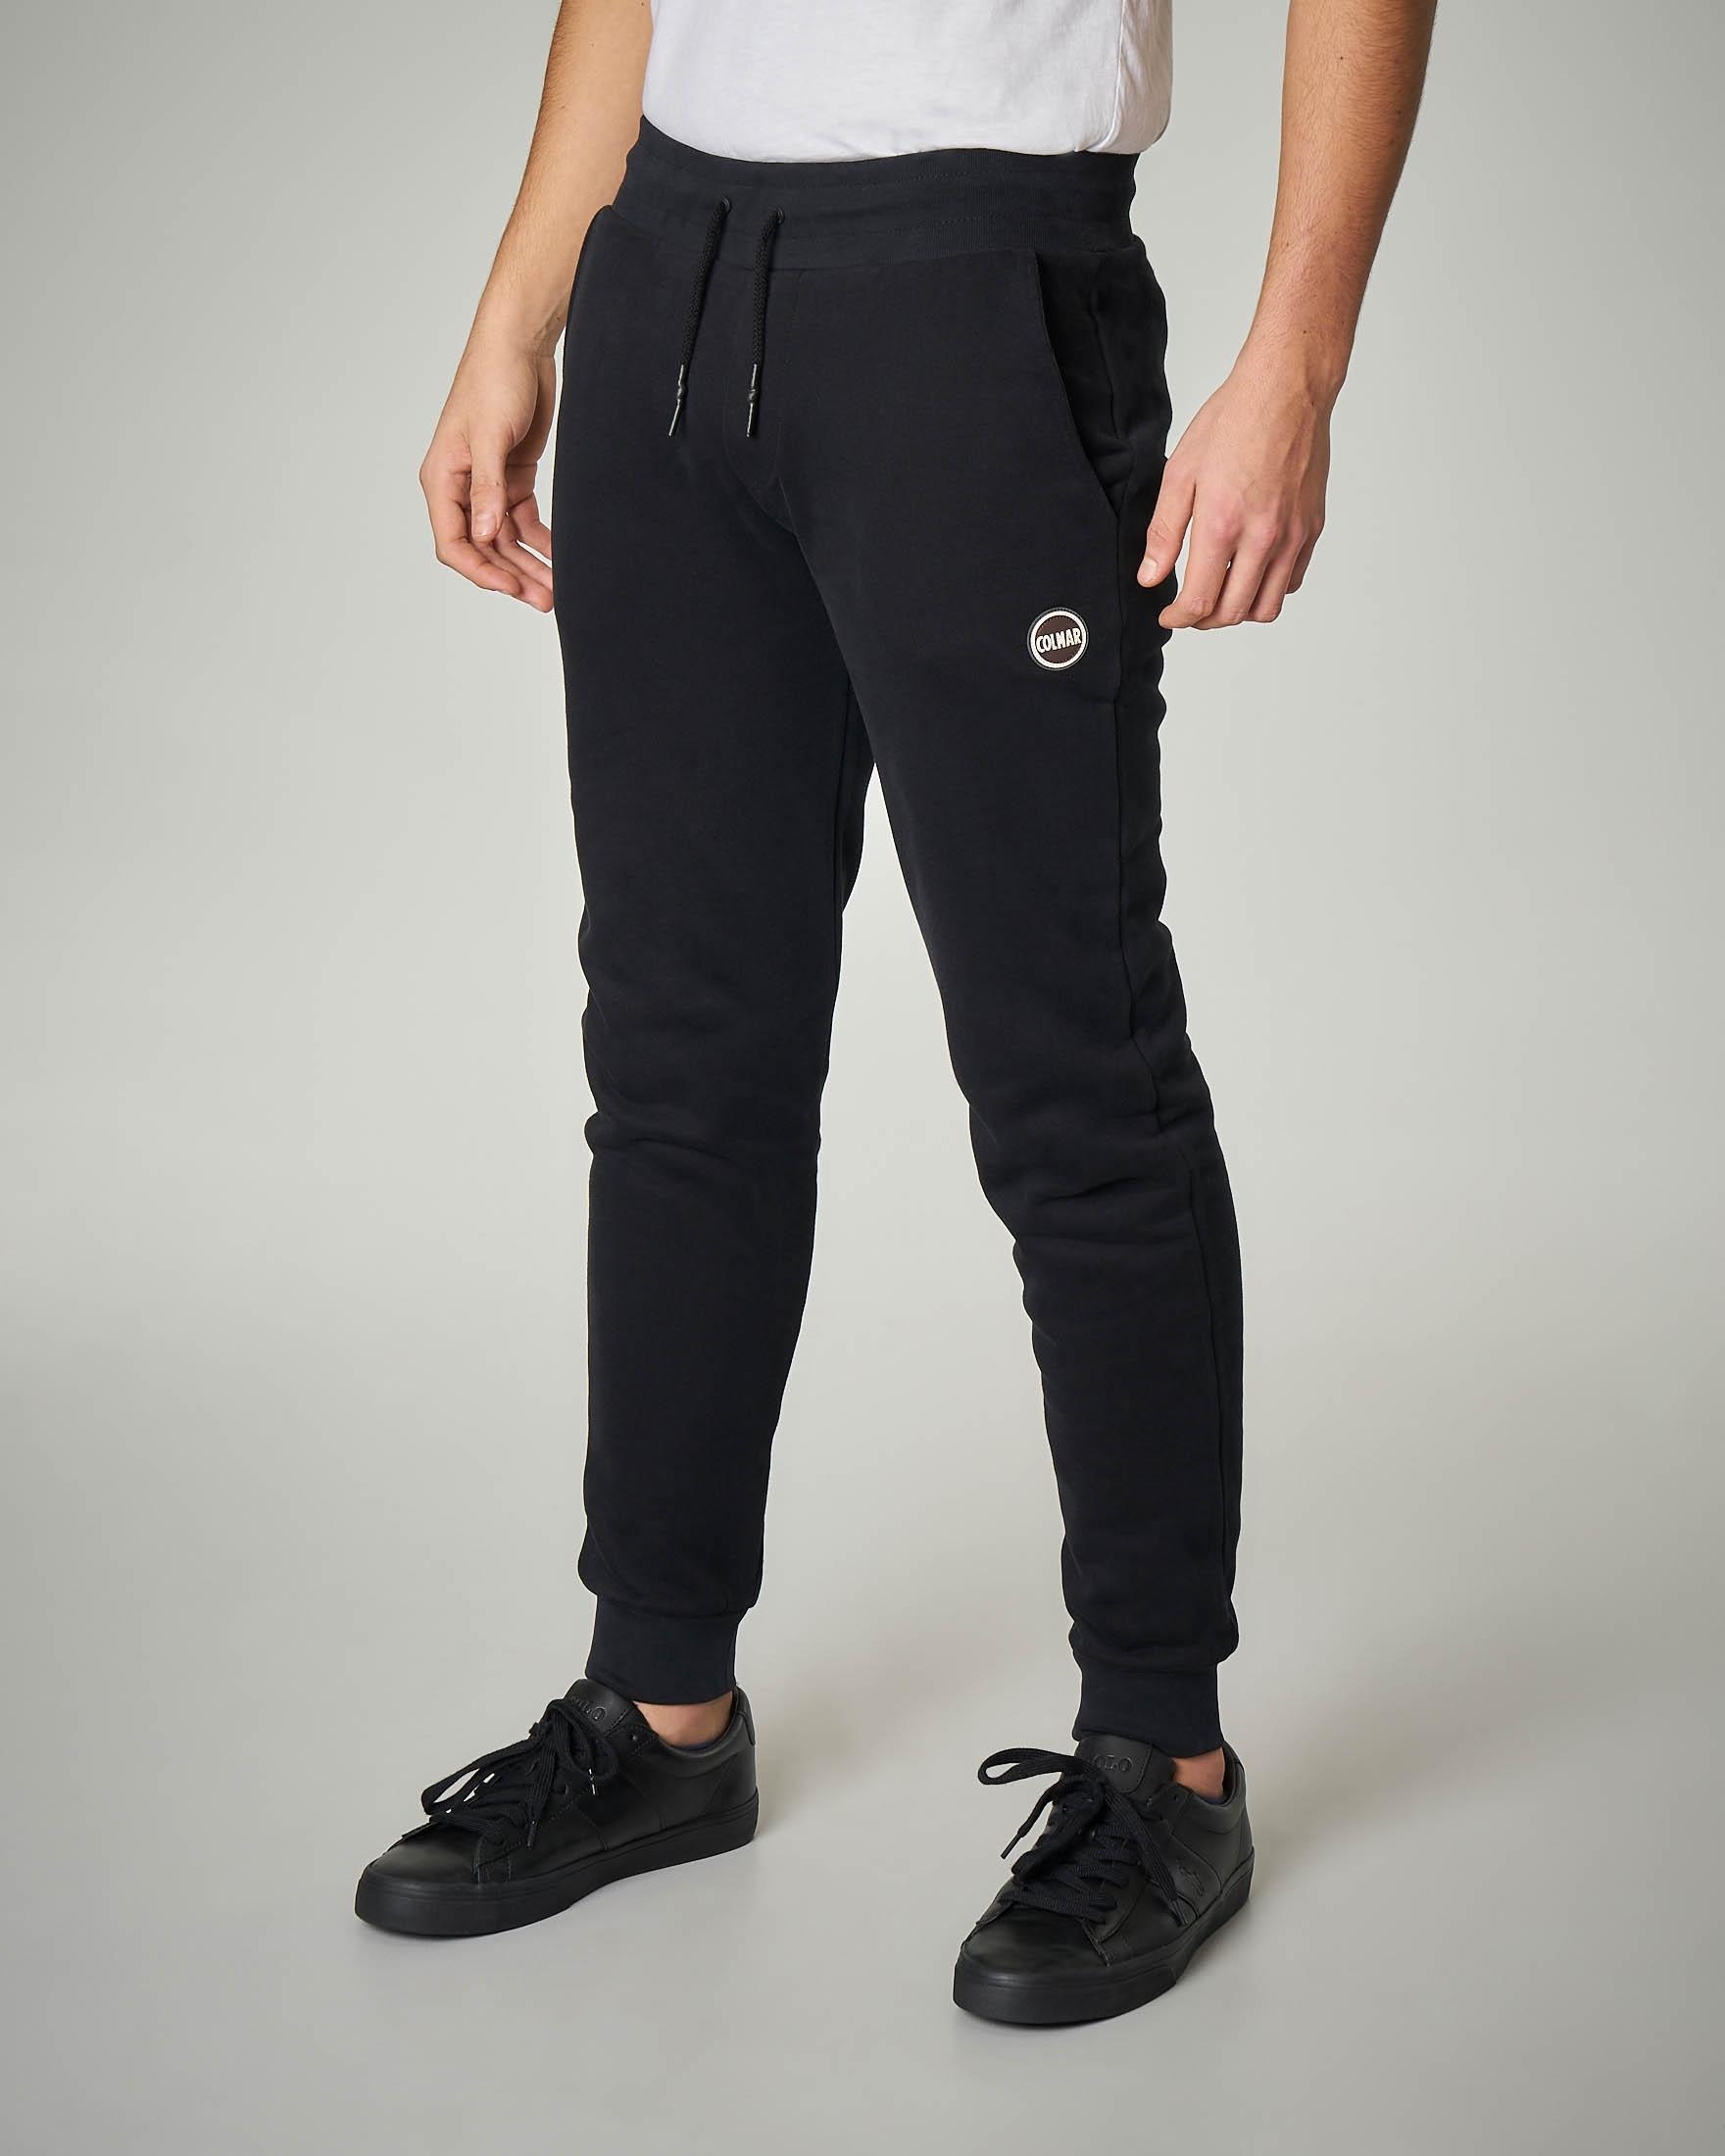 Pantalone nero in felpa